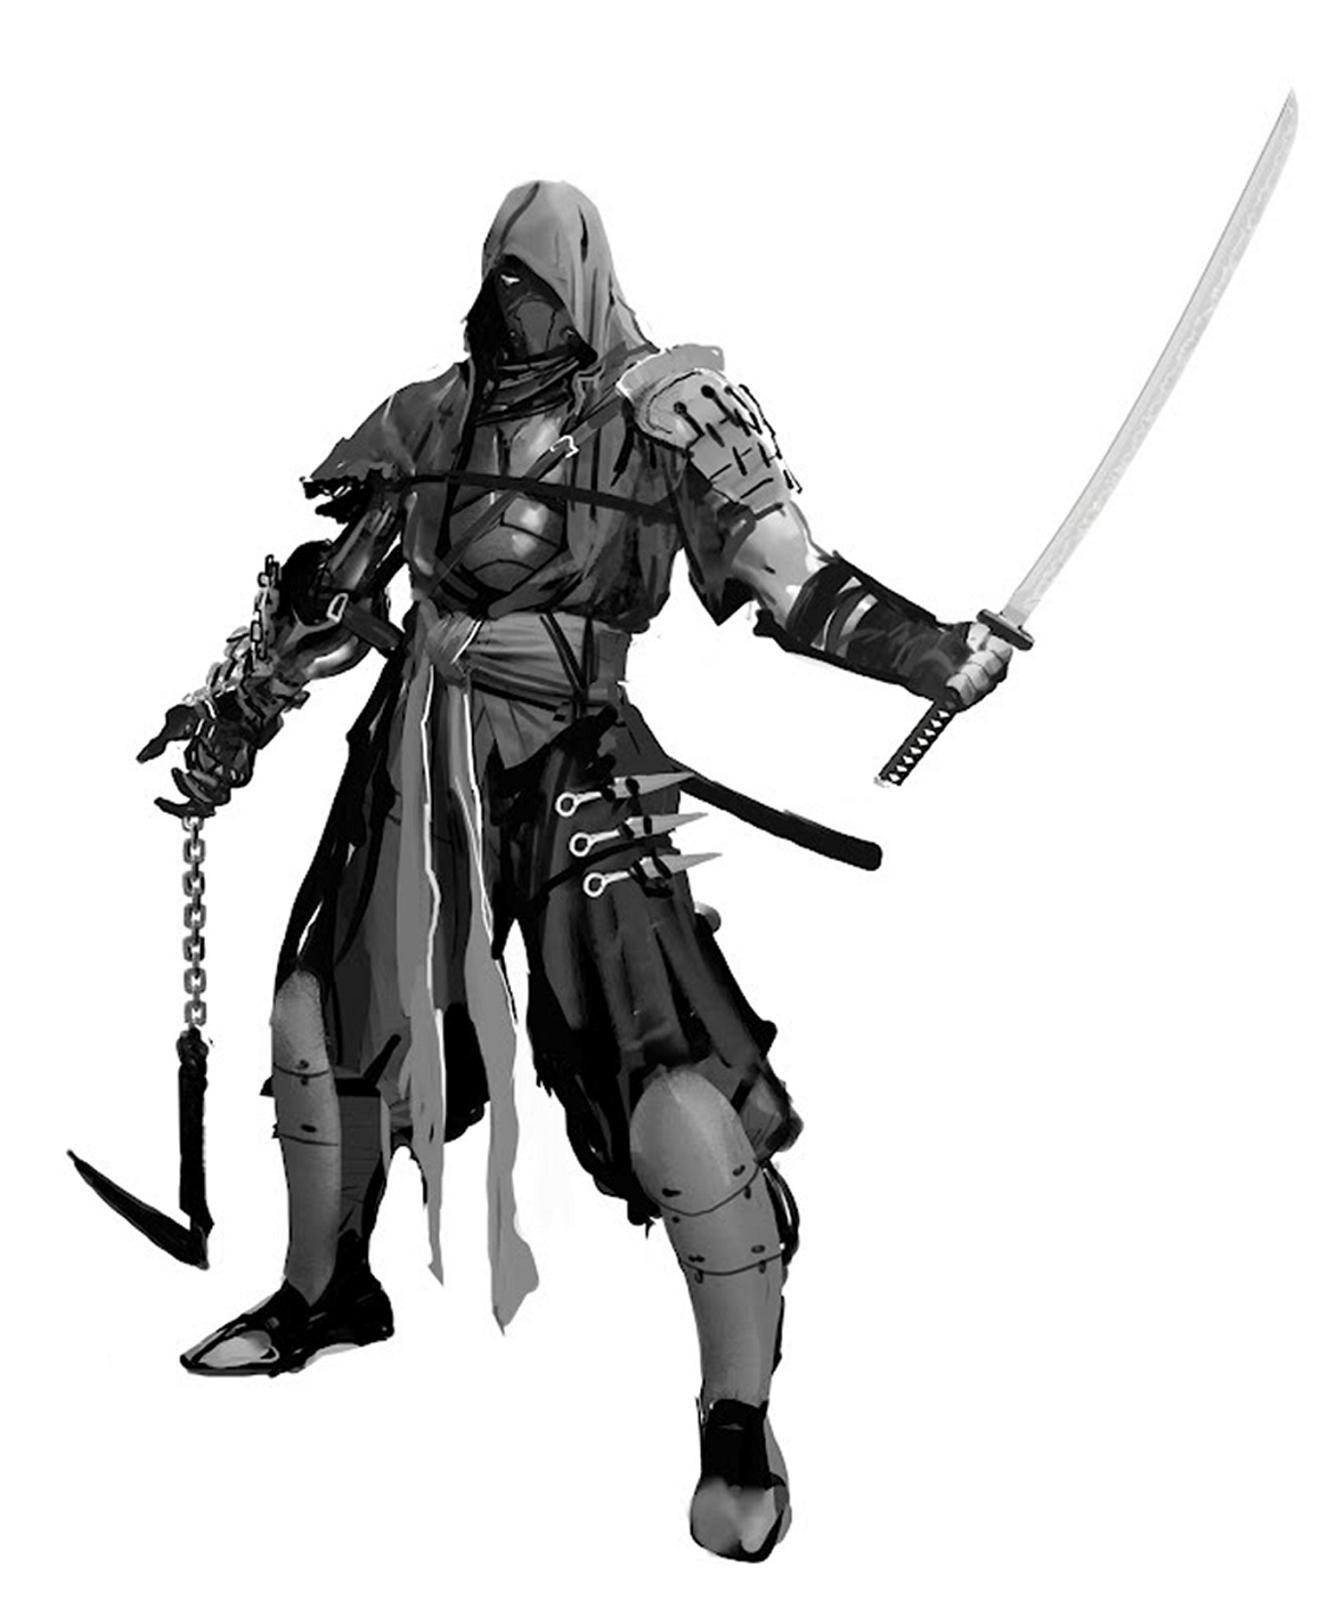 Ninja Warhamer En 2018 Pinterest Ninja Samourai Et Personnage